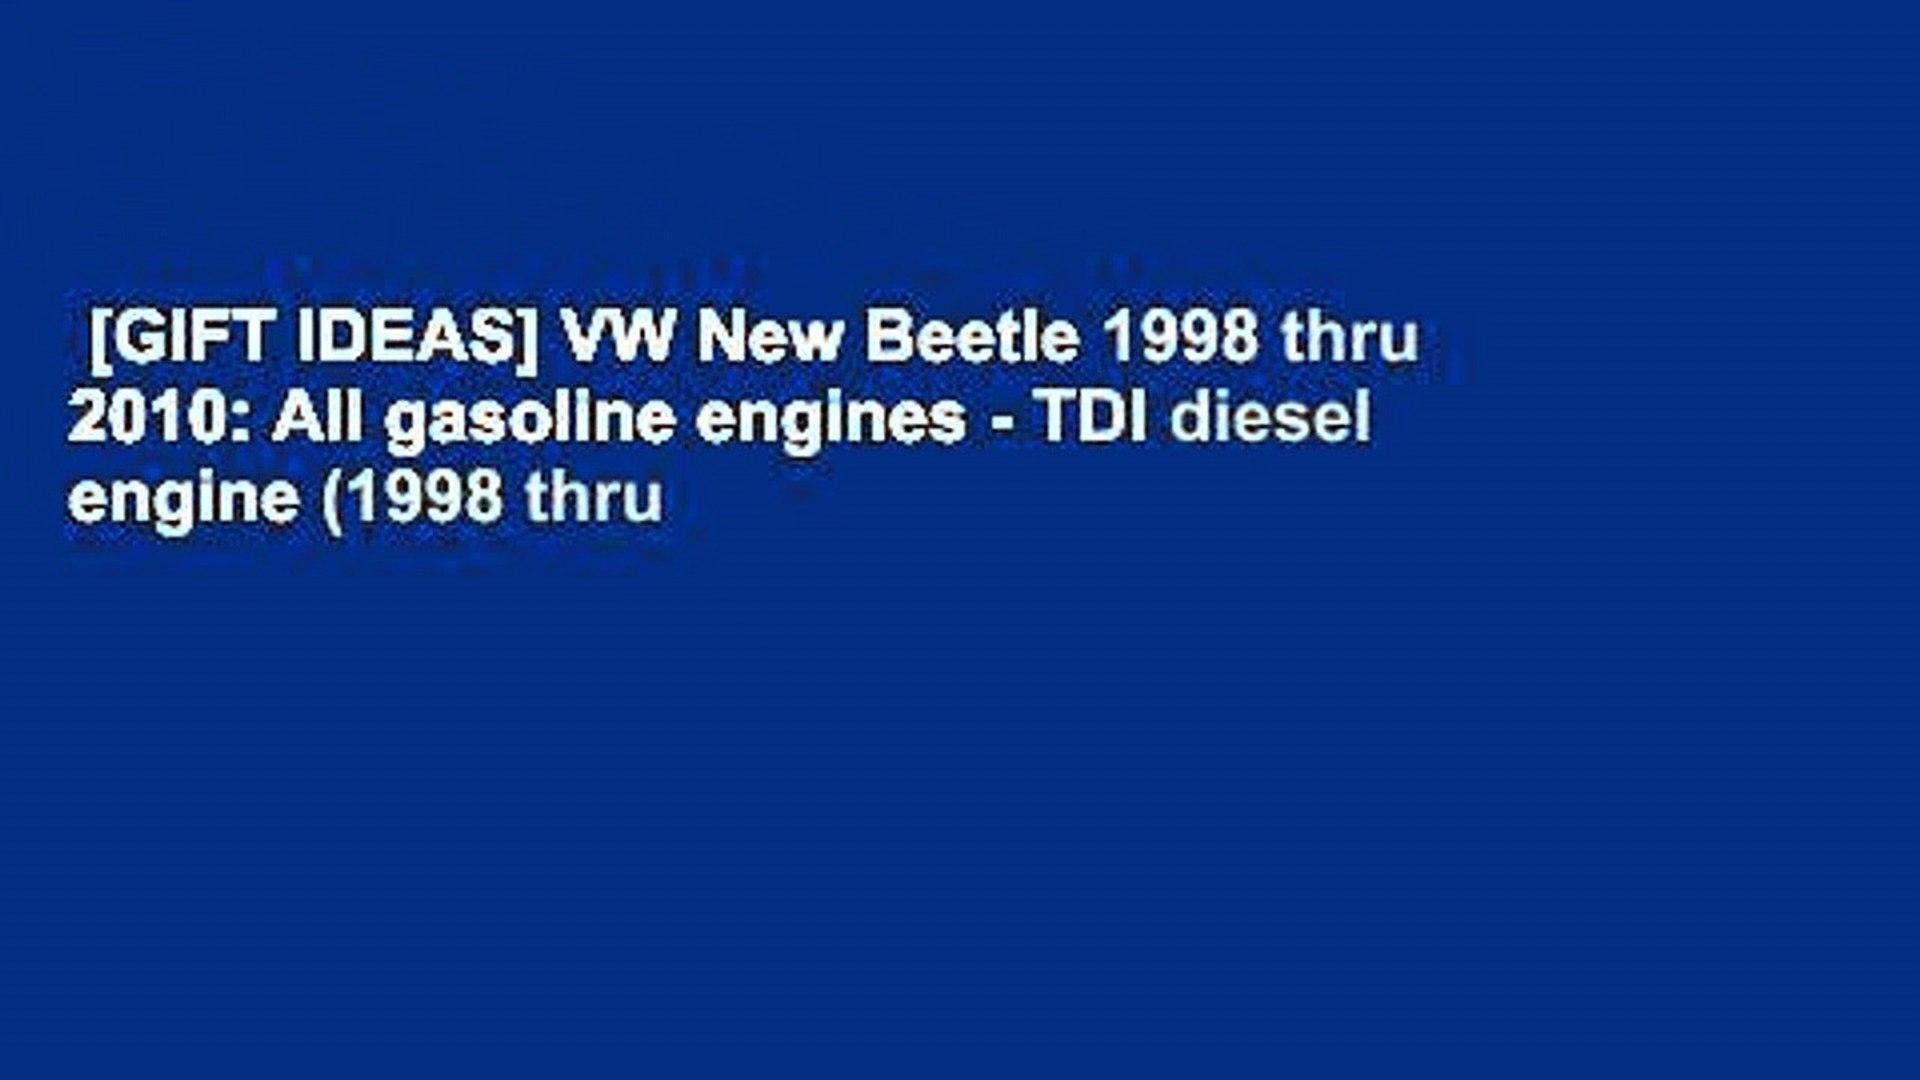 [GIFT IDEAS] VW New Beetle 1998 thru 2010: All gasoline engines - TDI diesel engine (1998 thru